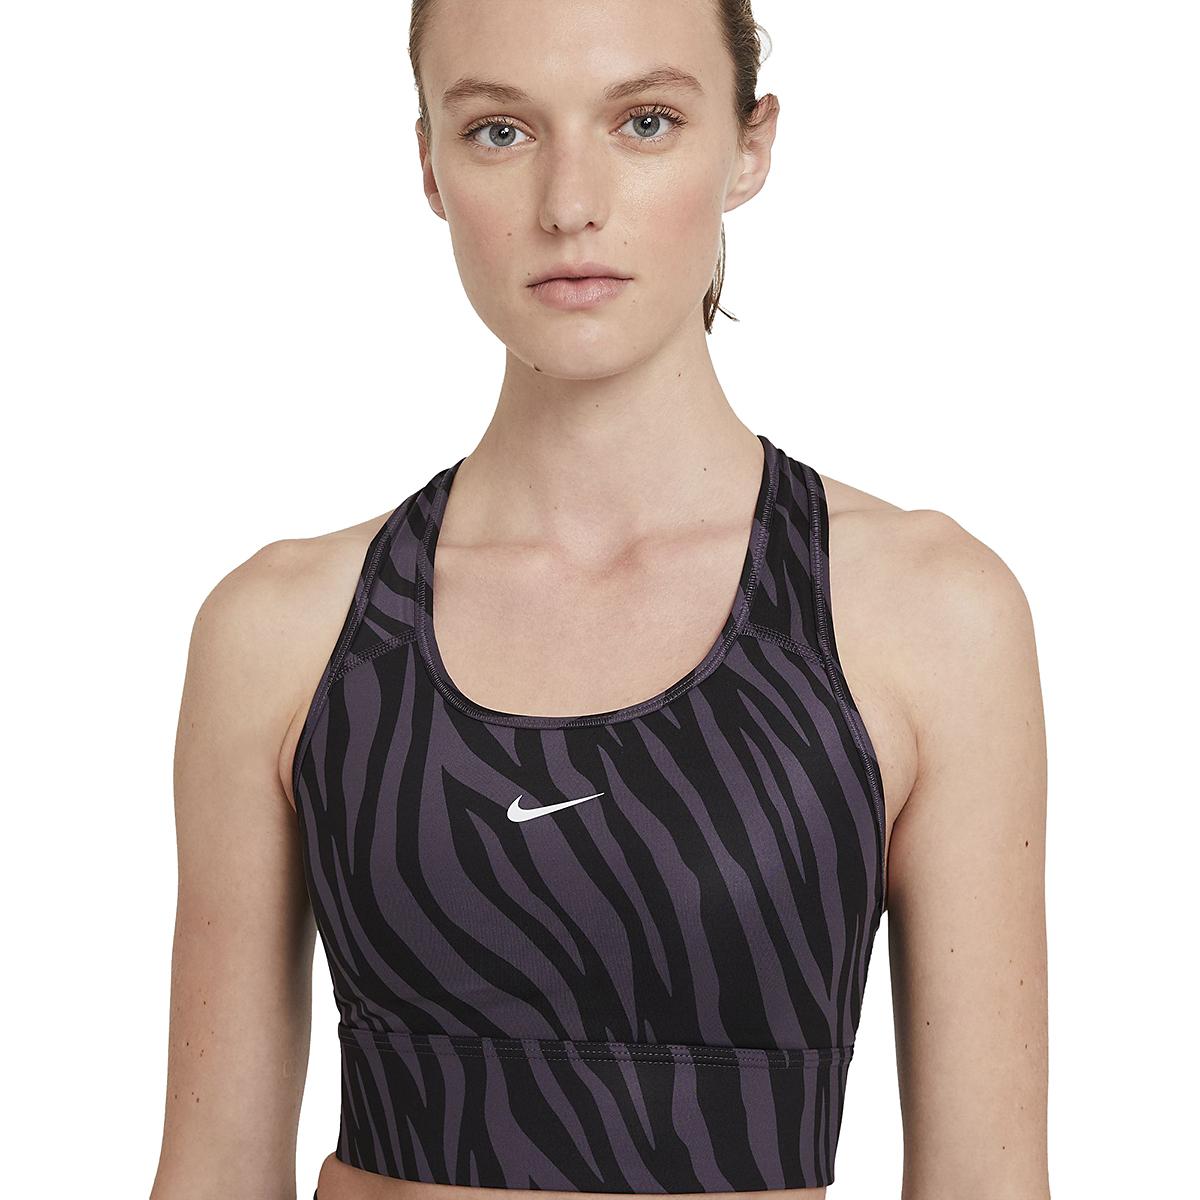 Women's Nike Dri-FIT Swoosh Icon Clash Bra - Color: Dark Raisin/White - Size: XS, Dark Raisin/White, large, image 2